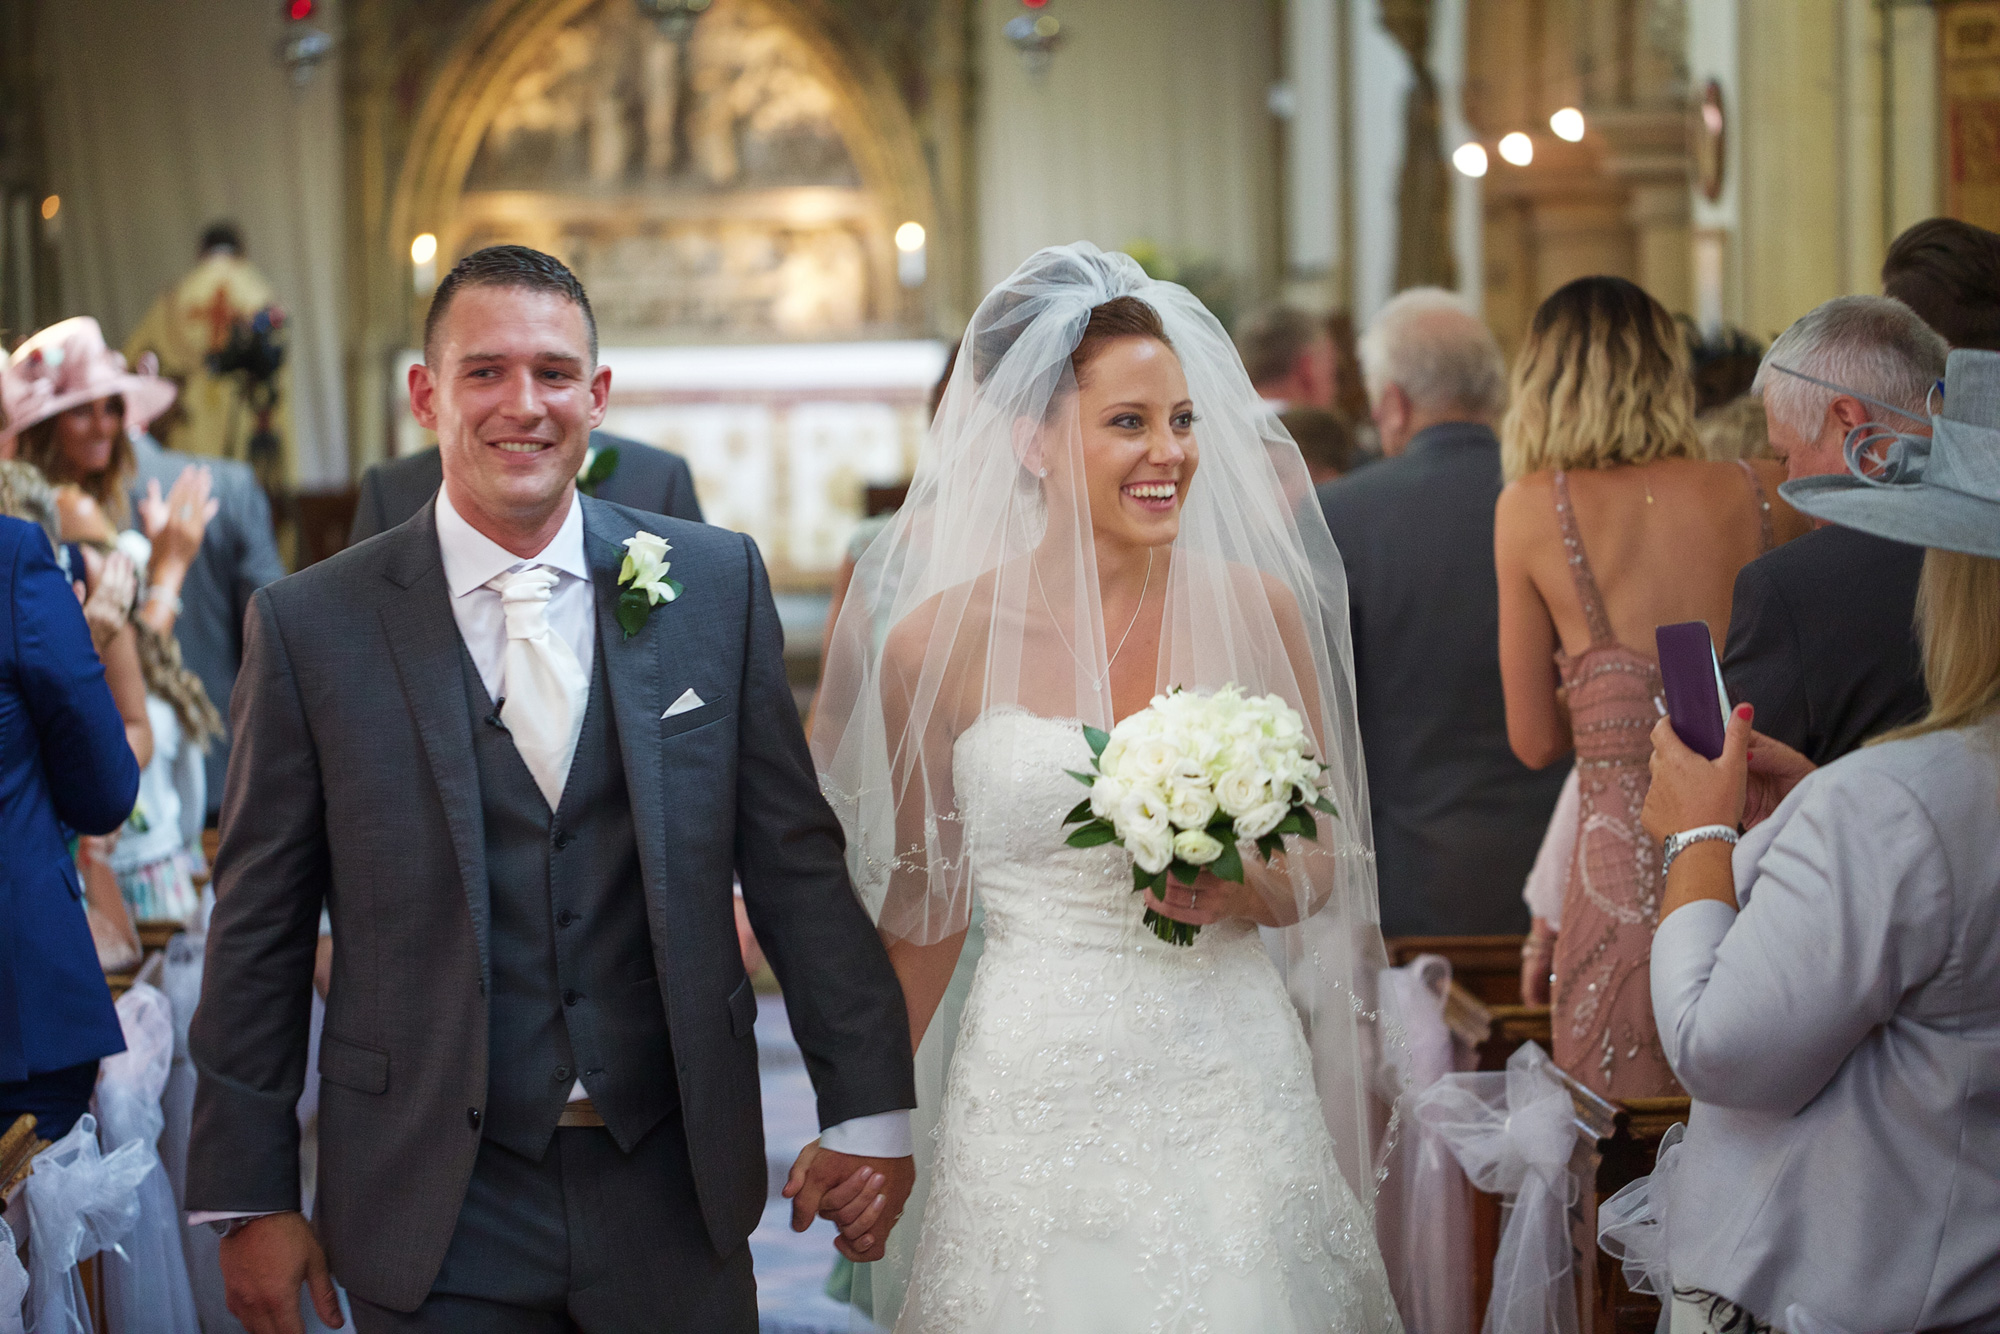 Adam_Hillier_Wedding_Photographer_Newbury_Berkshire_7 (3).jpg